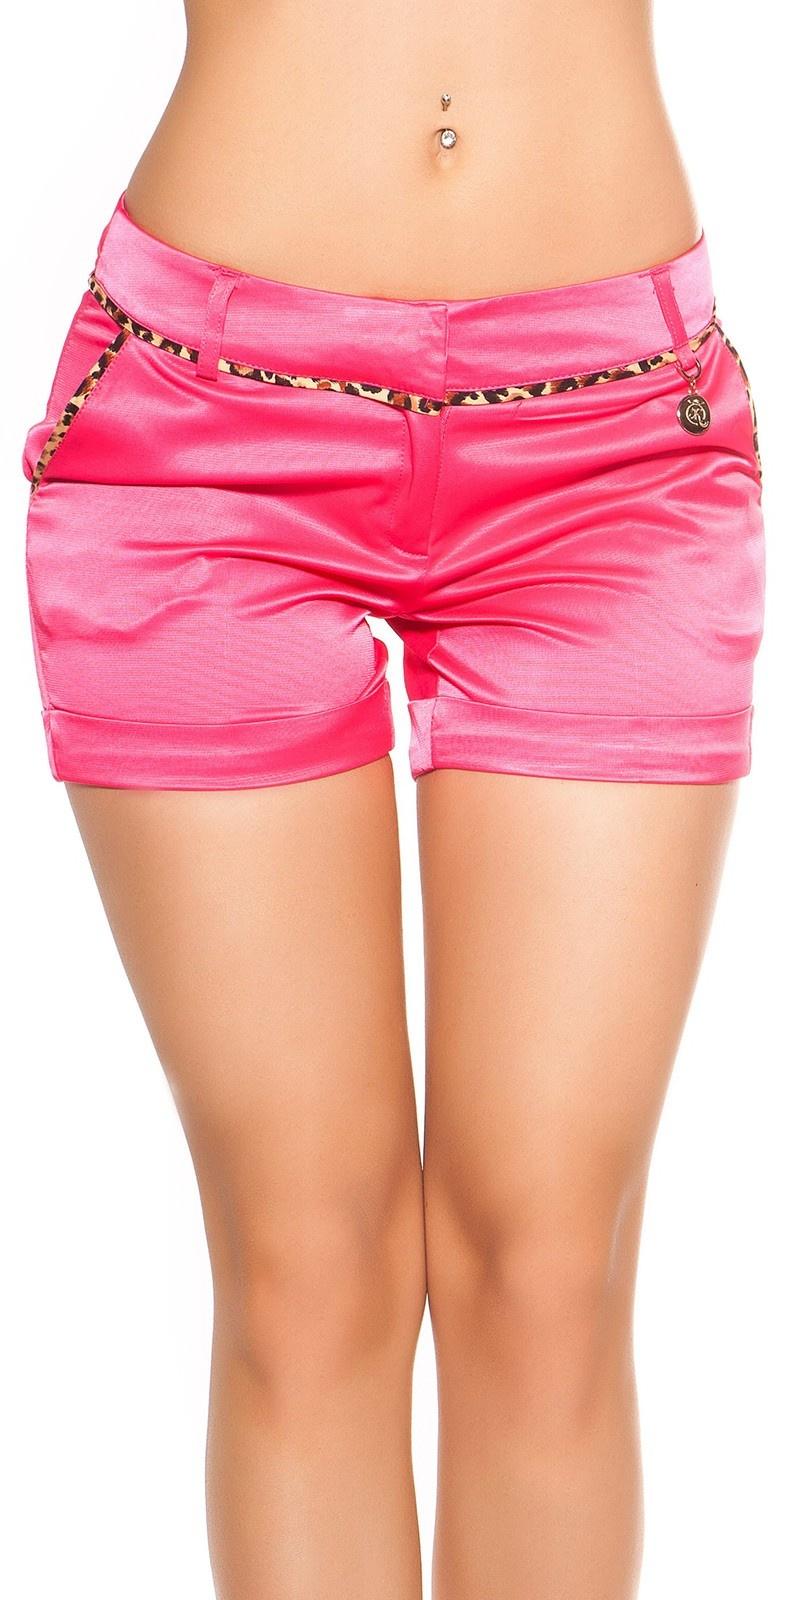 Sexy shorts met luipaard-naad fuchsiaroze